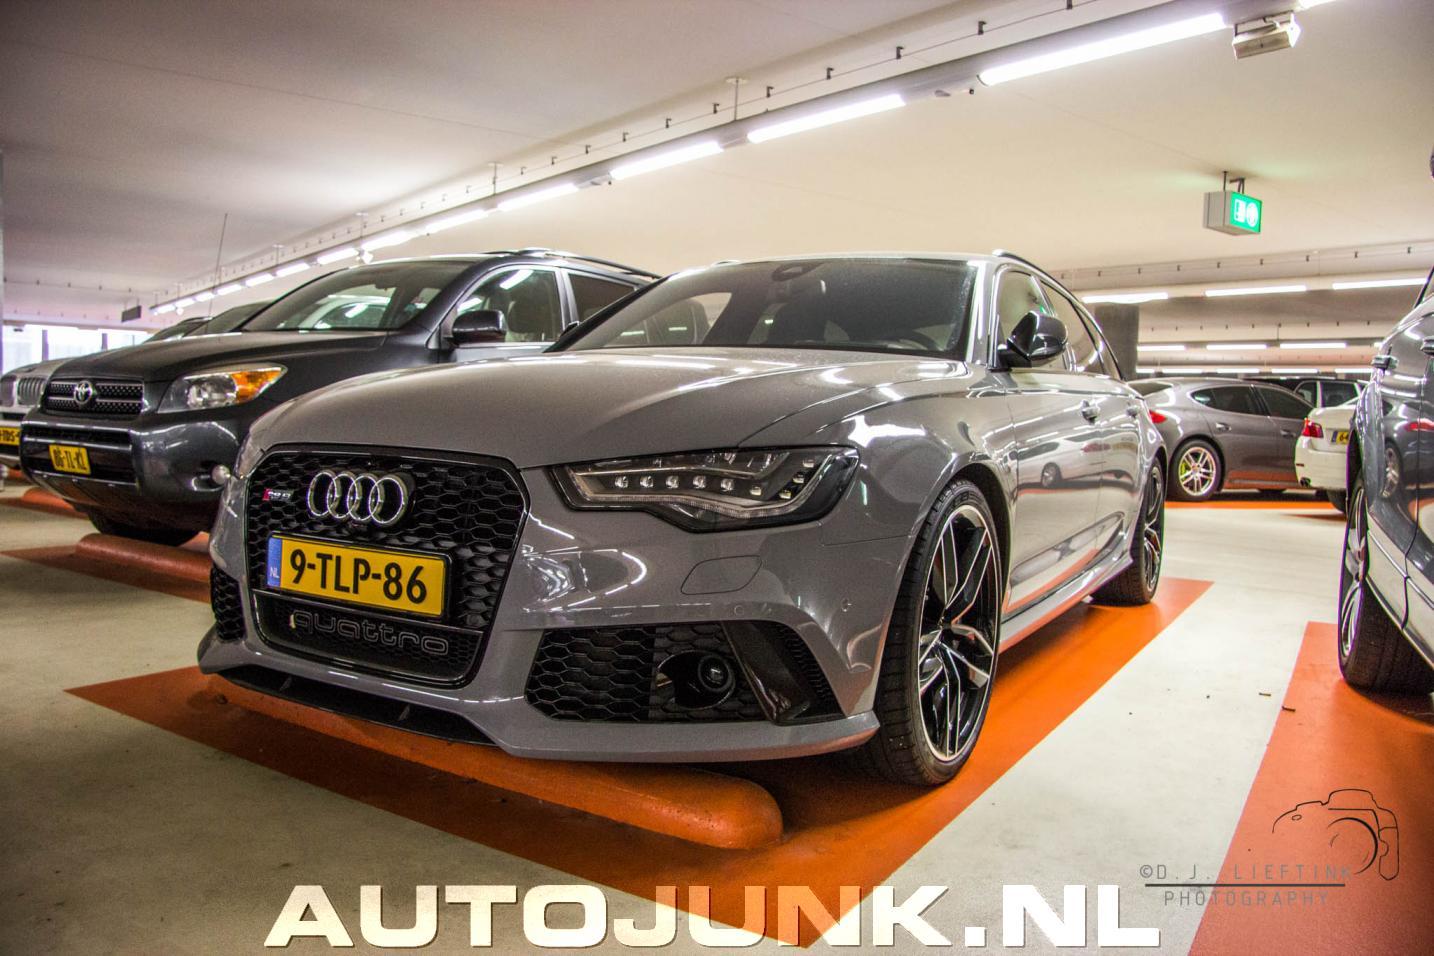 Audi RS6 C7 In Nardo Grey Fotos Autojunknl 115589